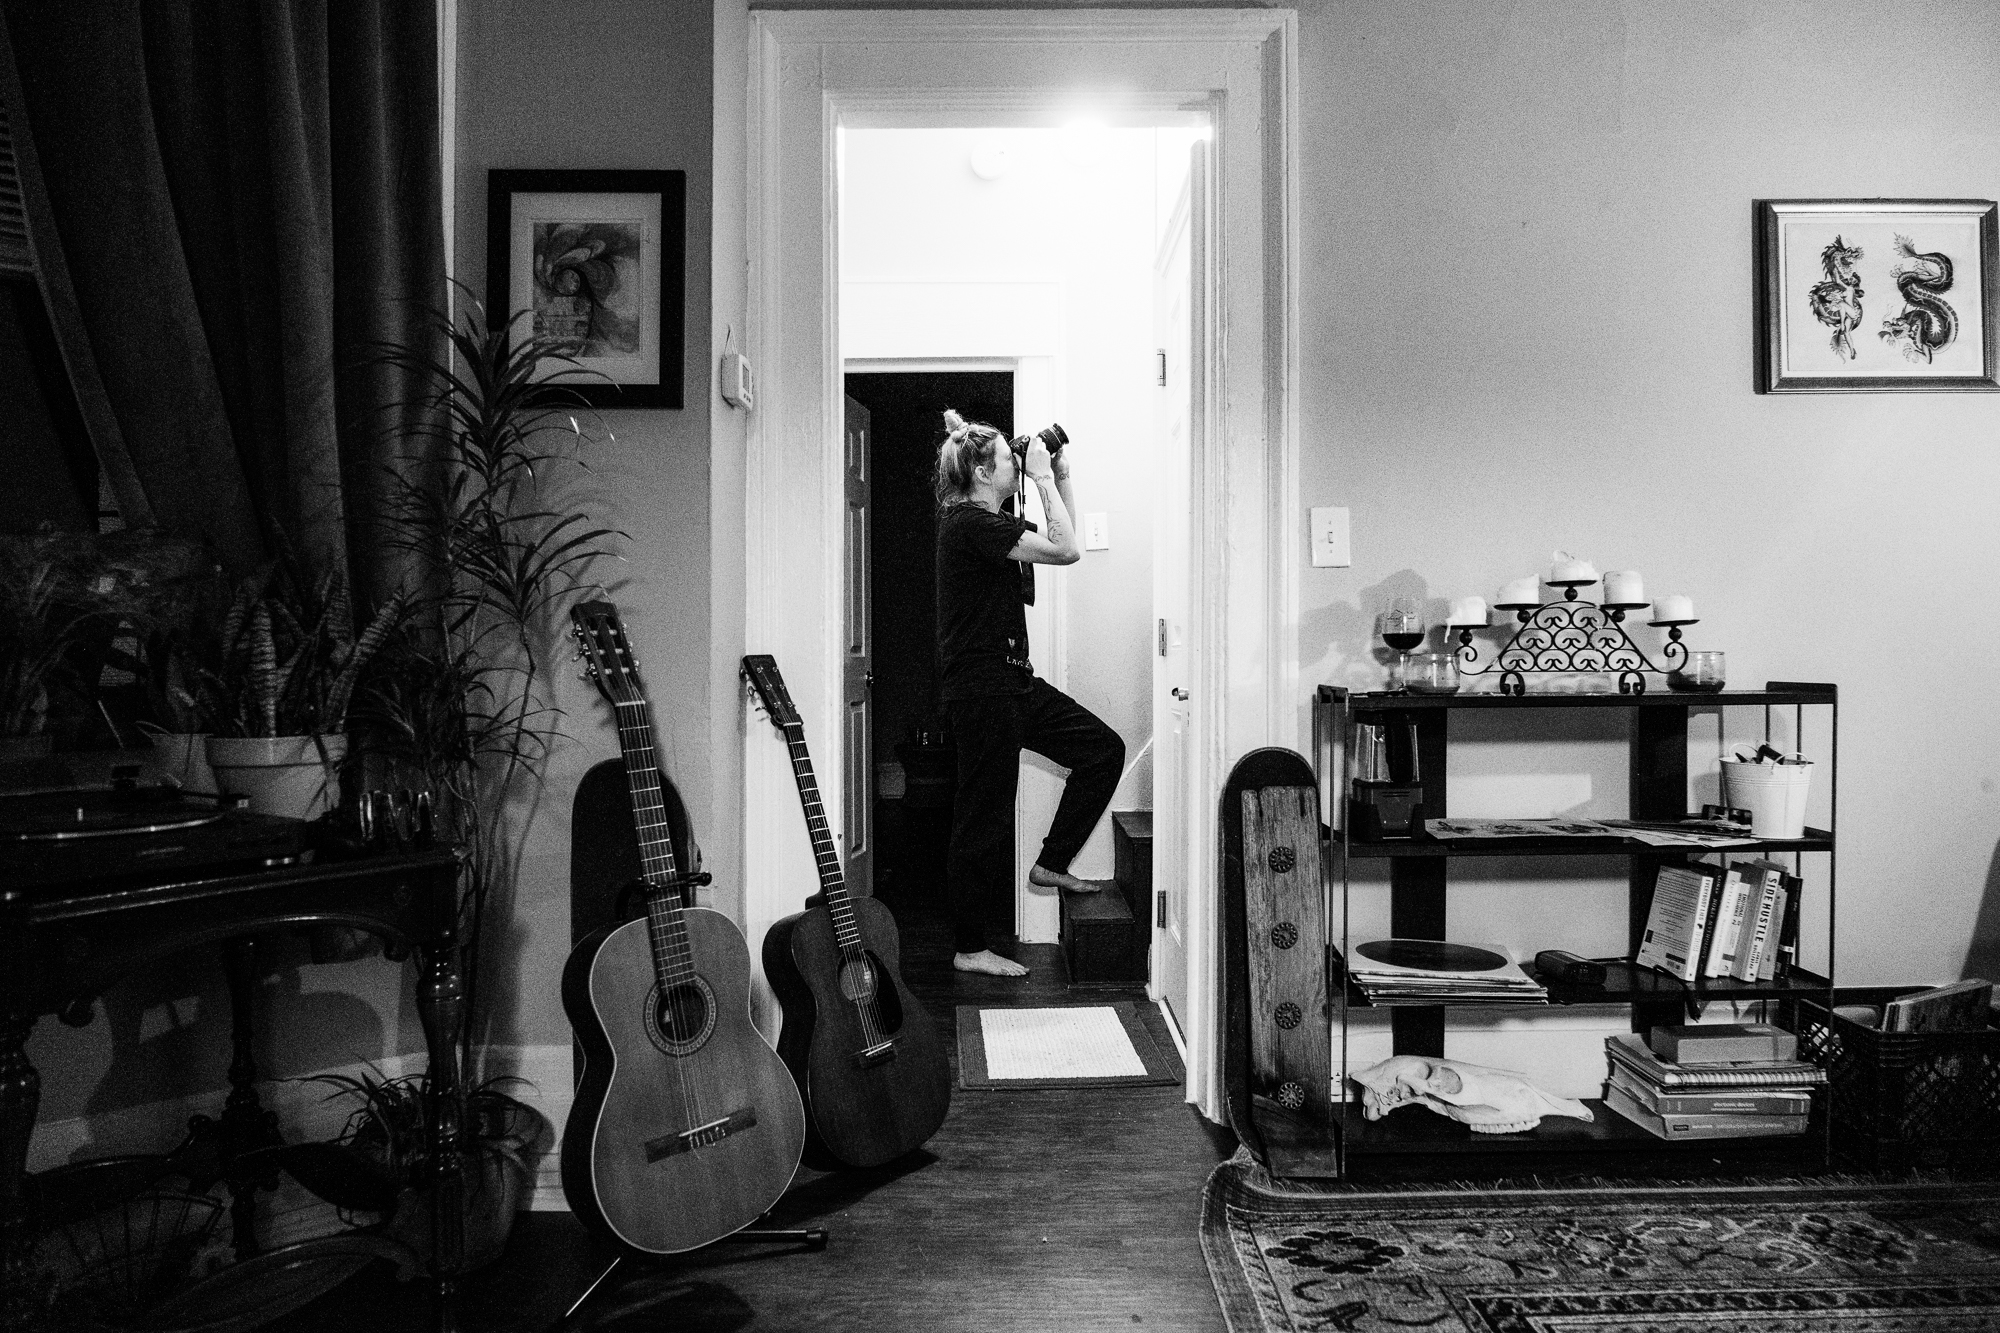 20181128-Brandi-Hannah-apartment-X-T2-0010-Edit.jpg